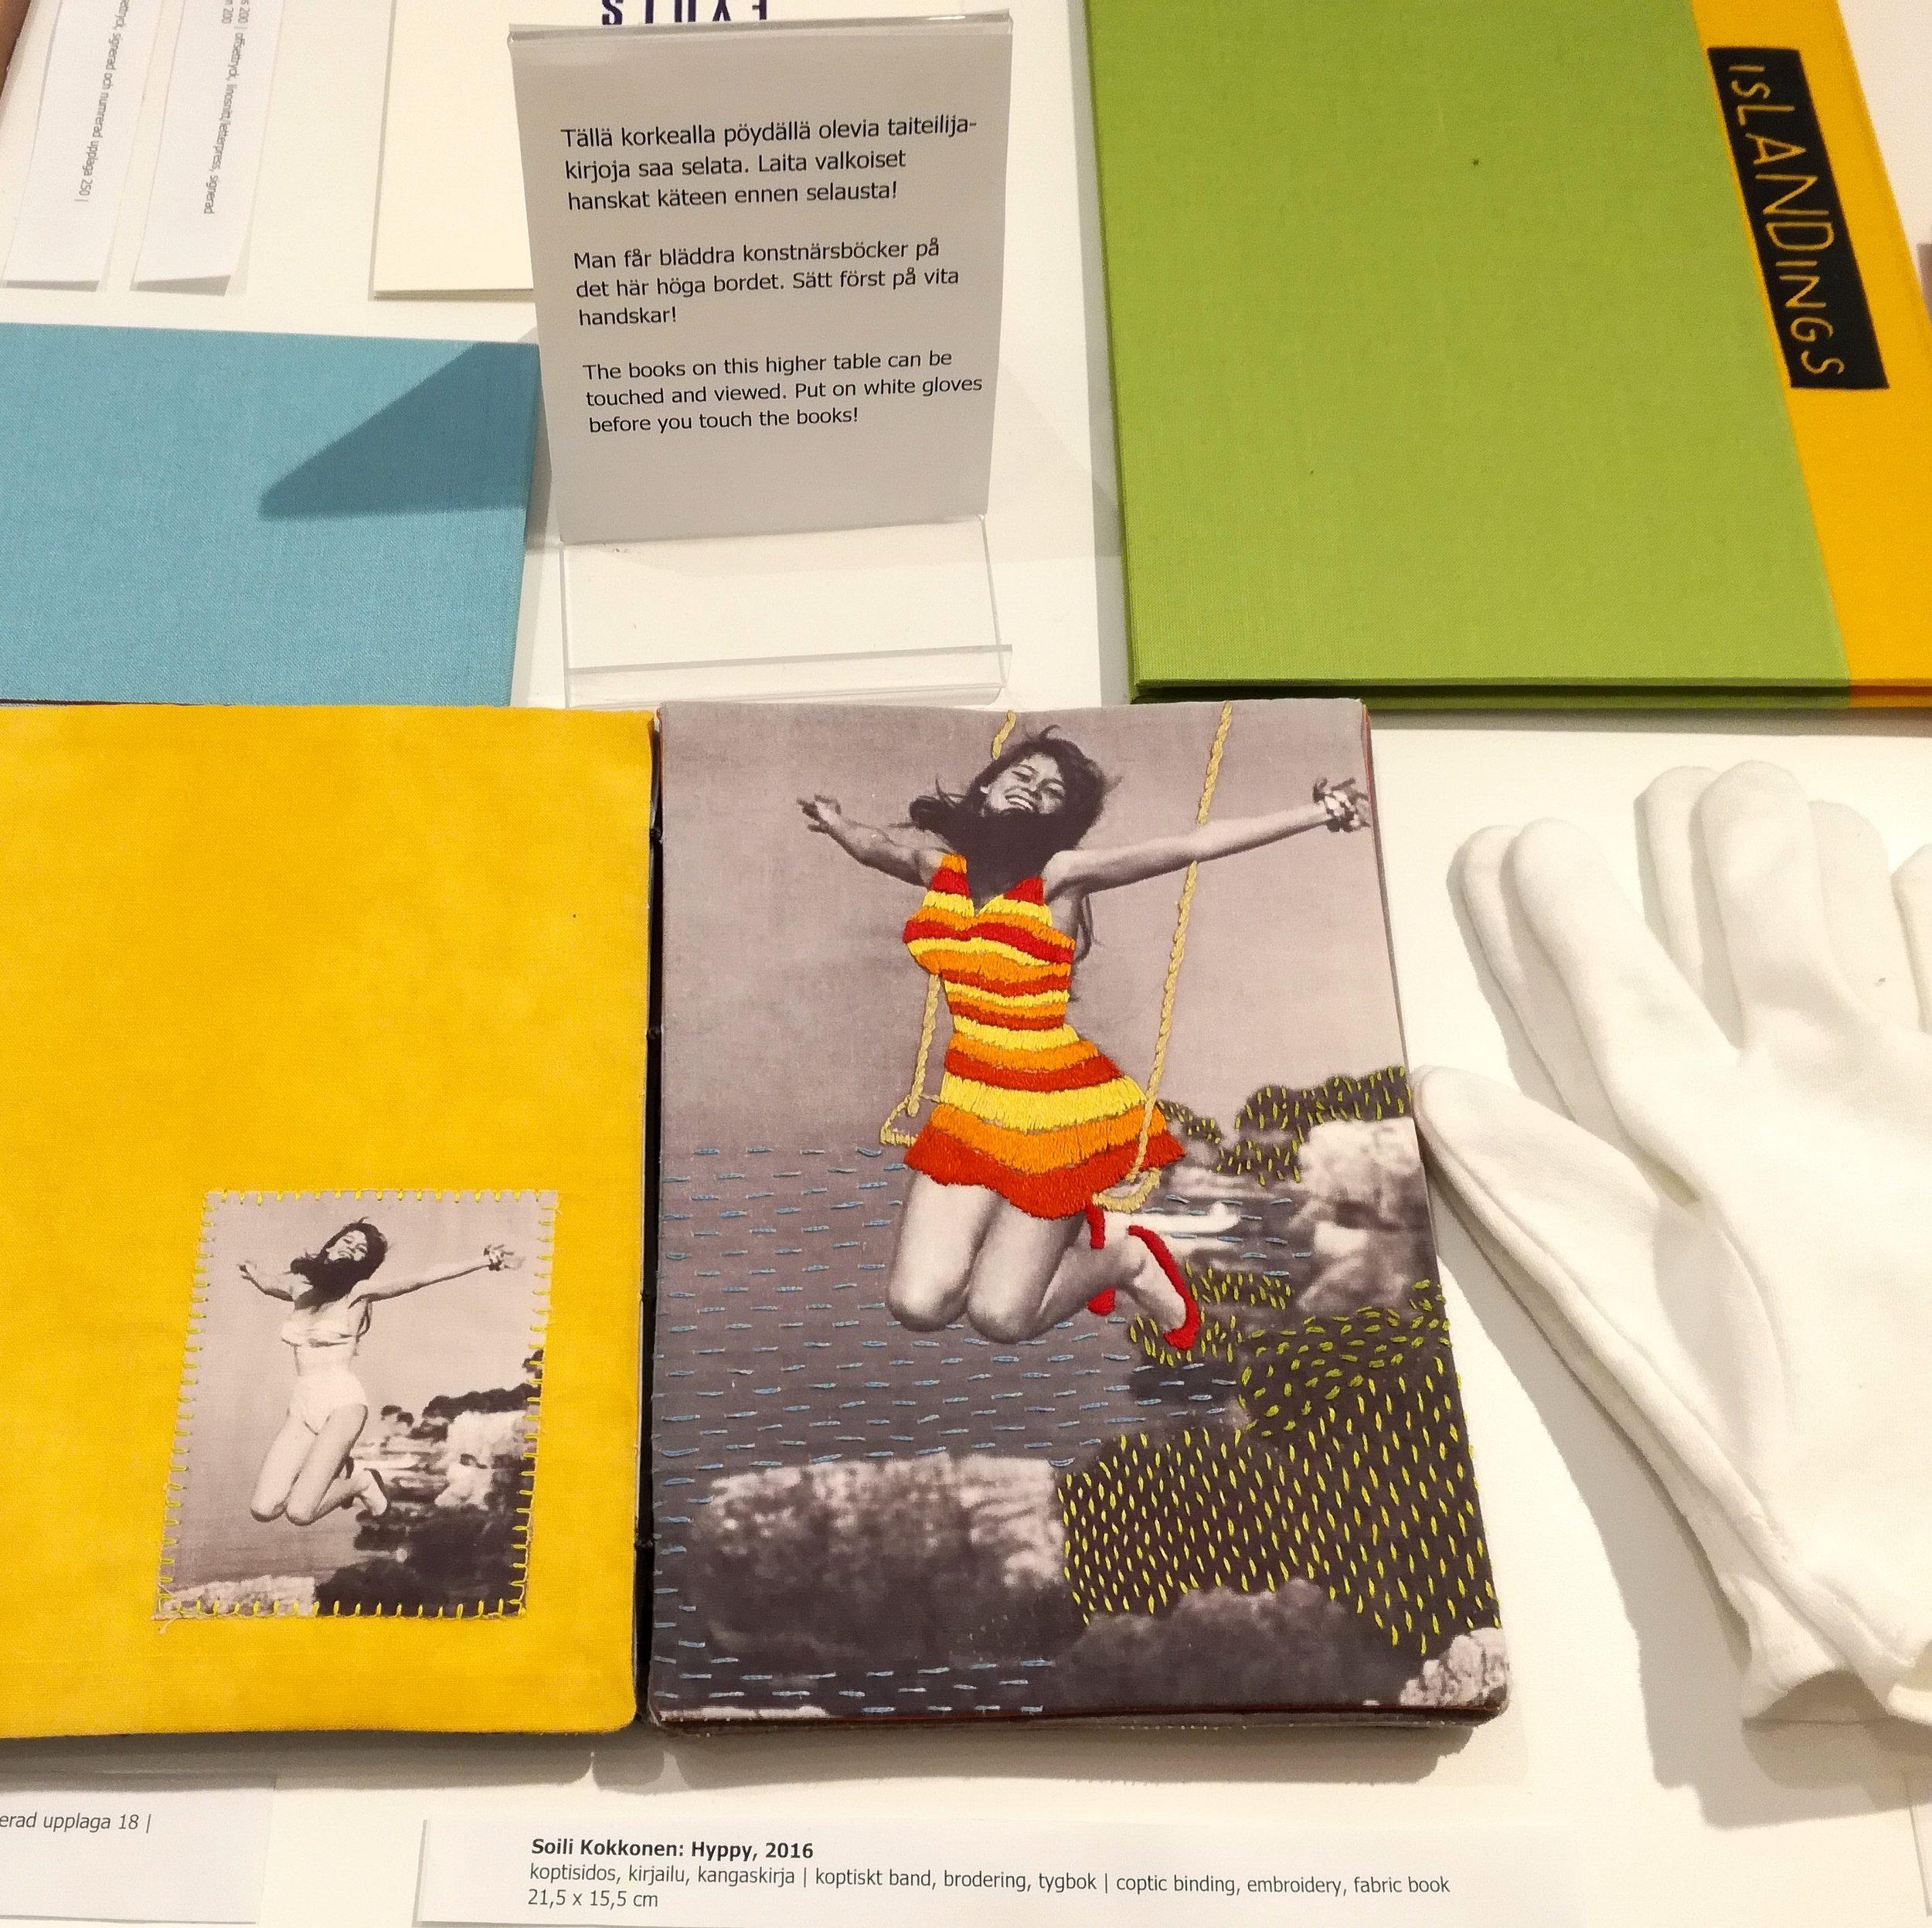 Hyppy, 2016, by Soili Kokkonen coptic binding, embroidery, fabric book - 21,5x15,5cm